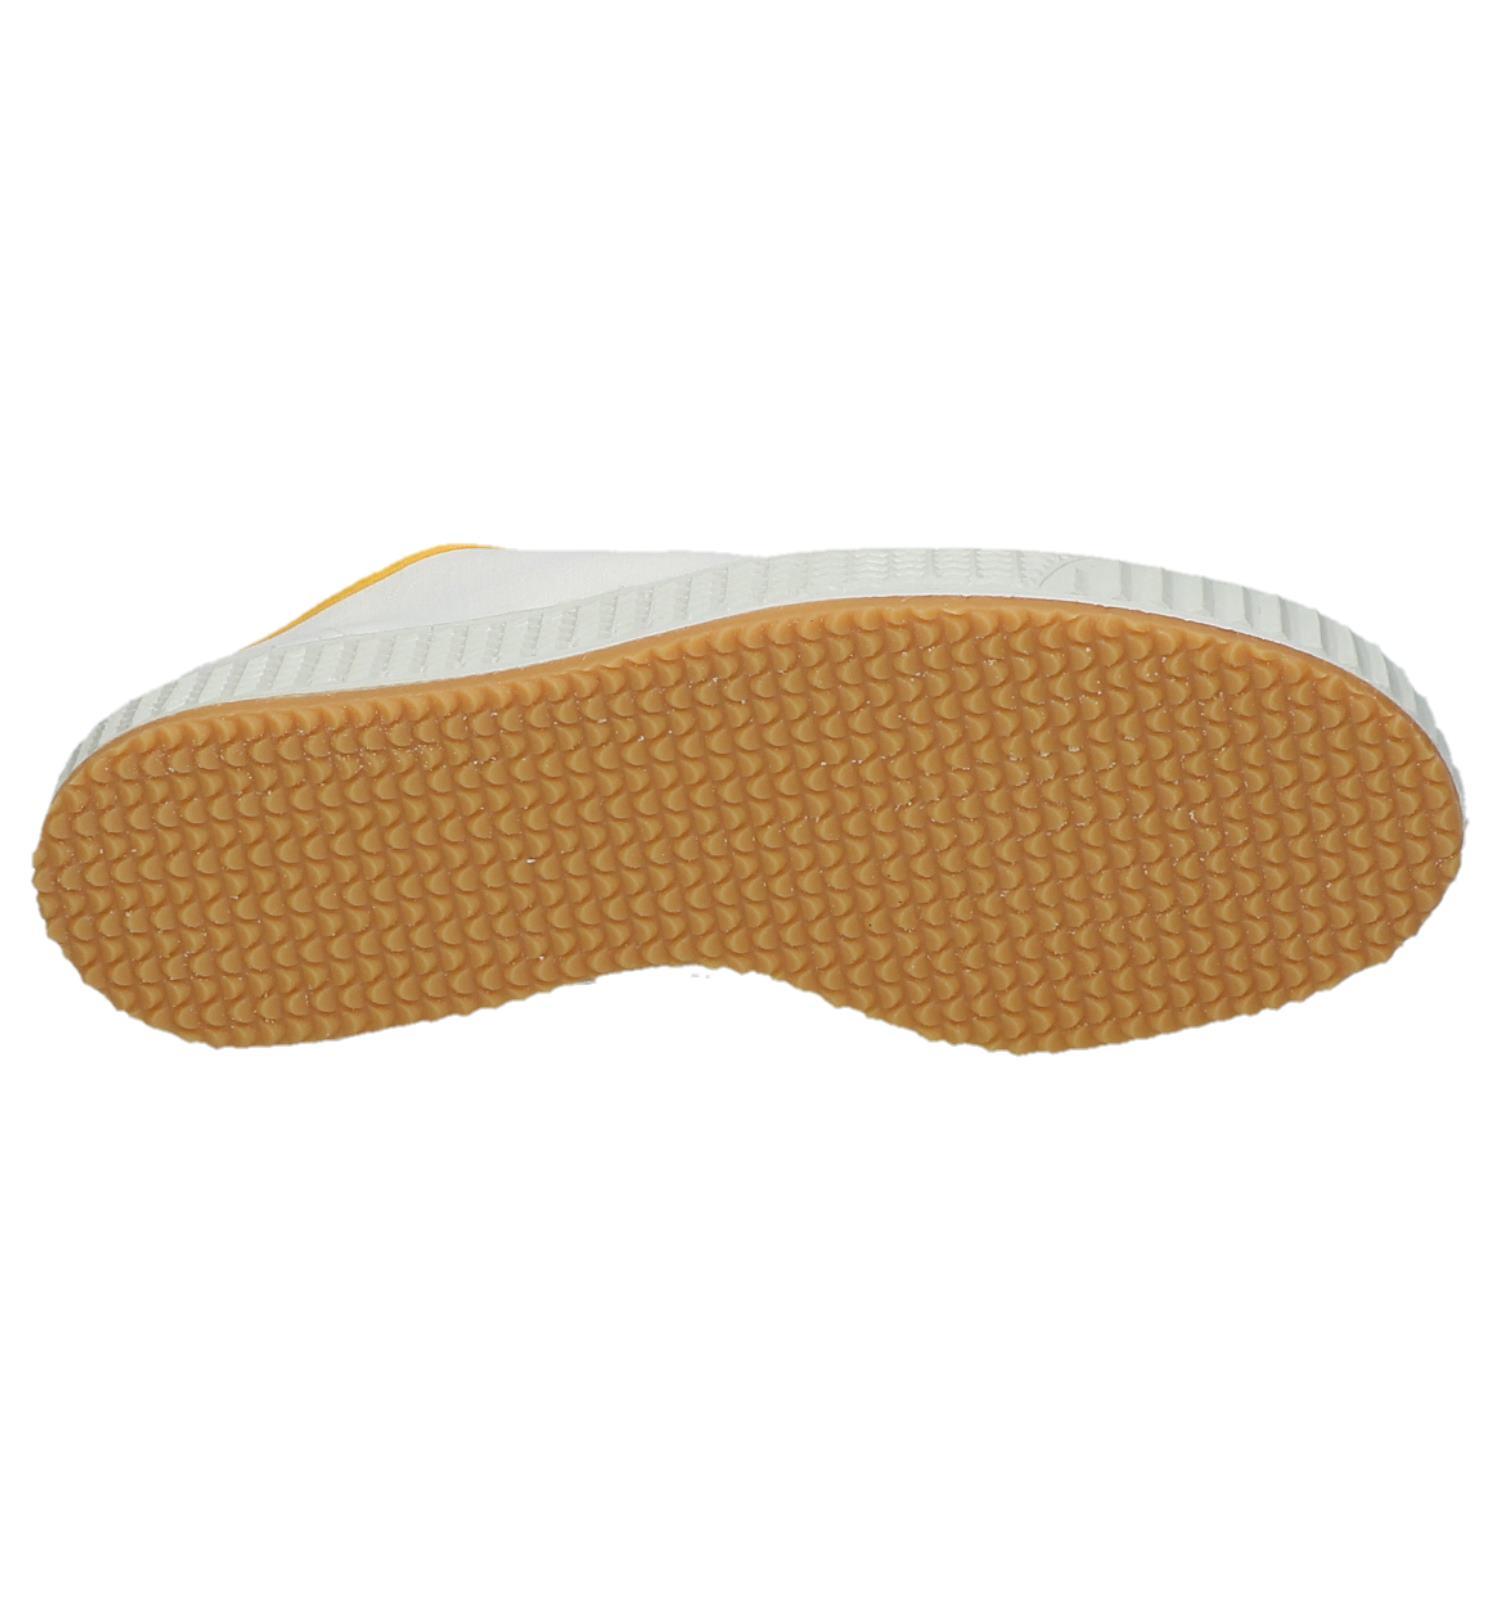 Komrads Sneakers Komrads Wit Wit Komrads Lenin Sneakers Sneakers Wit Lenin Komrads Lenin Sneakers 45ARjL